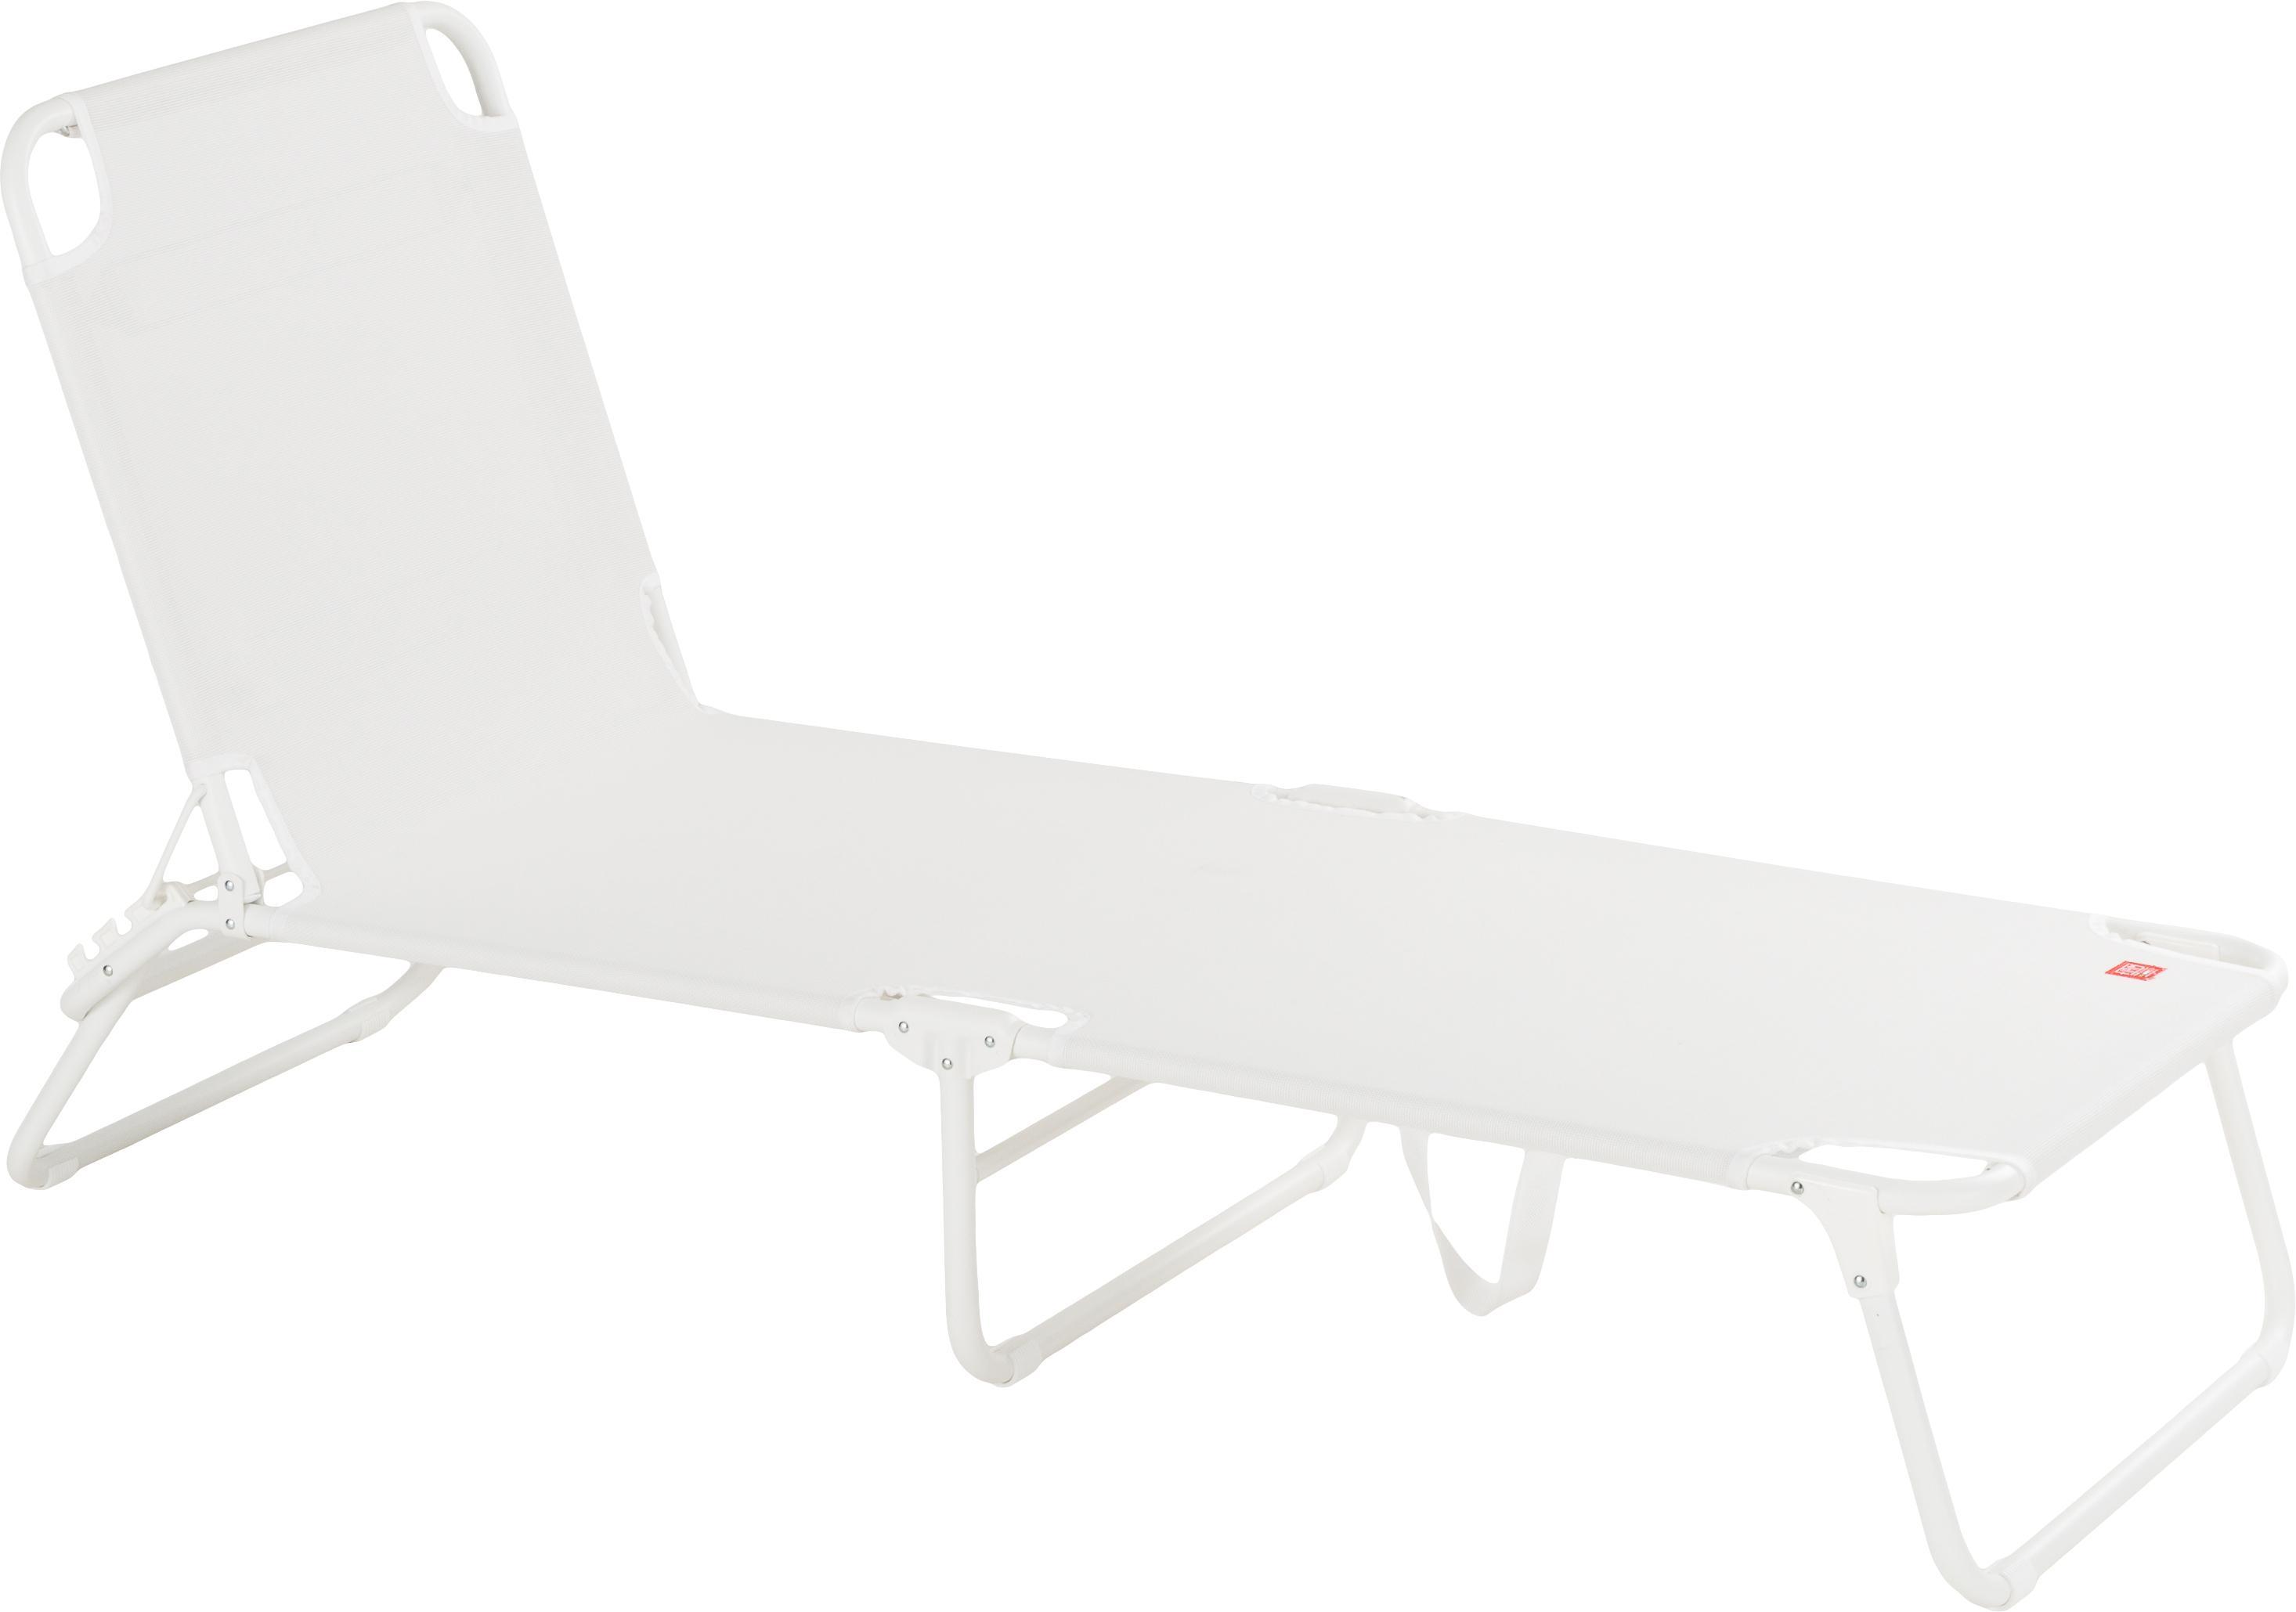 Gartenliege Fiam Amigo ohne Armlehne, Gestell: Aluminium, Bezug: Polyester, Weiss, 58 x 190 cm